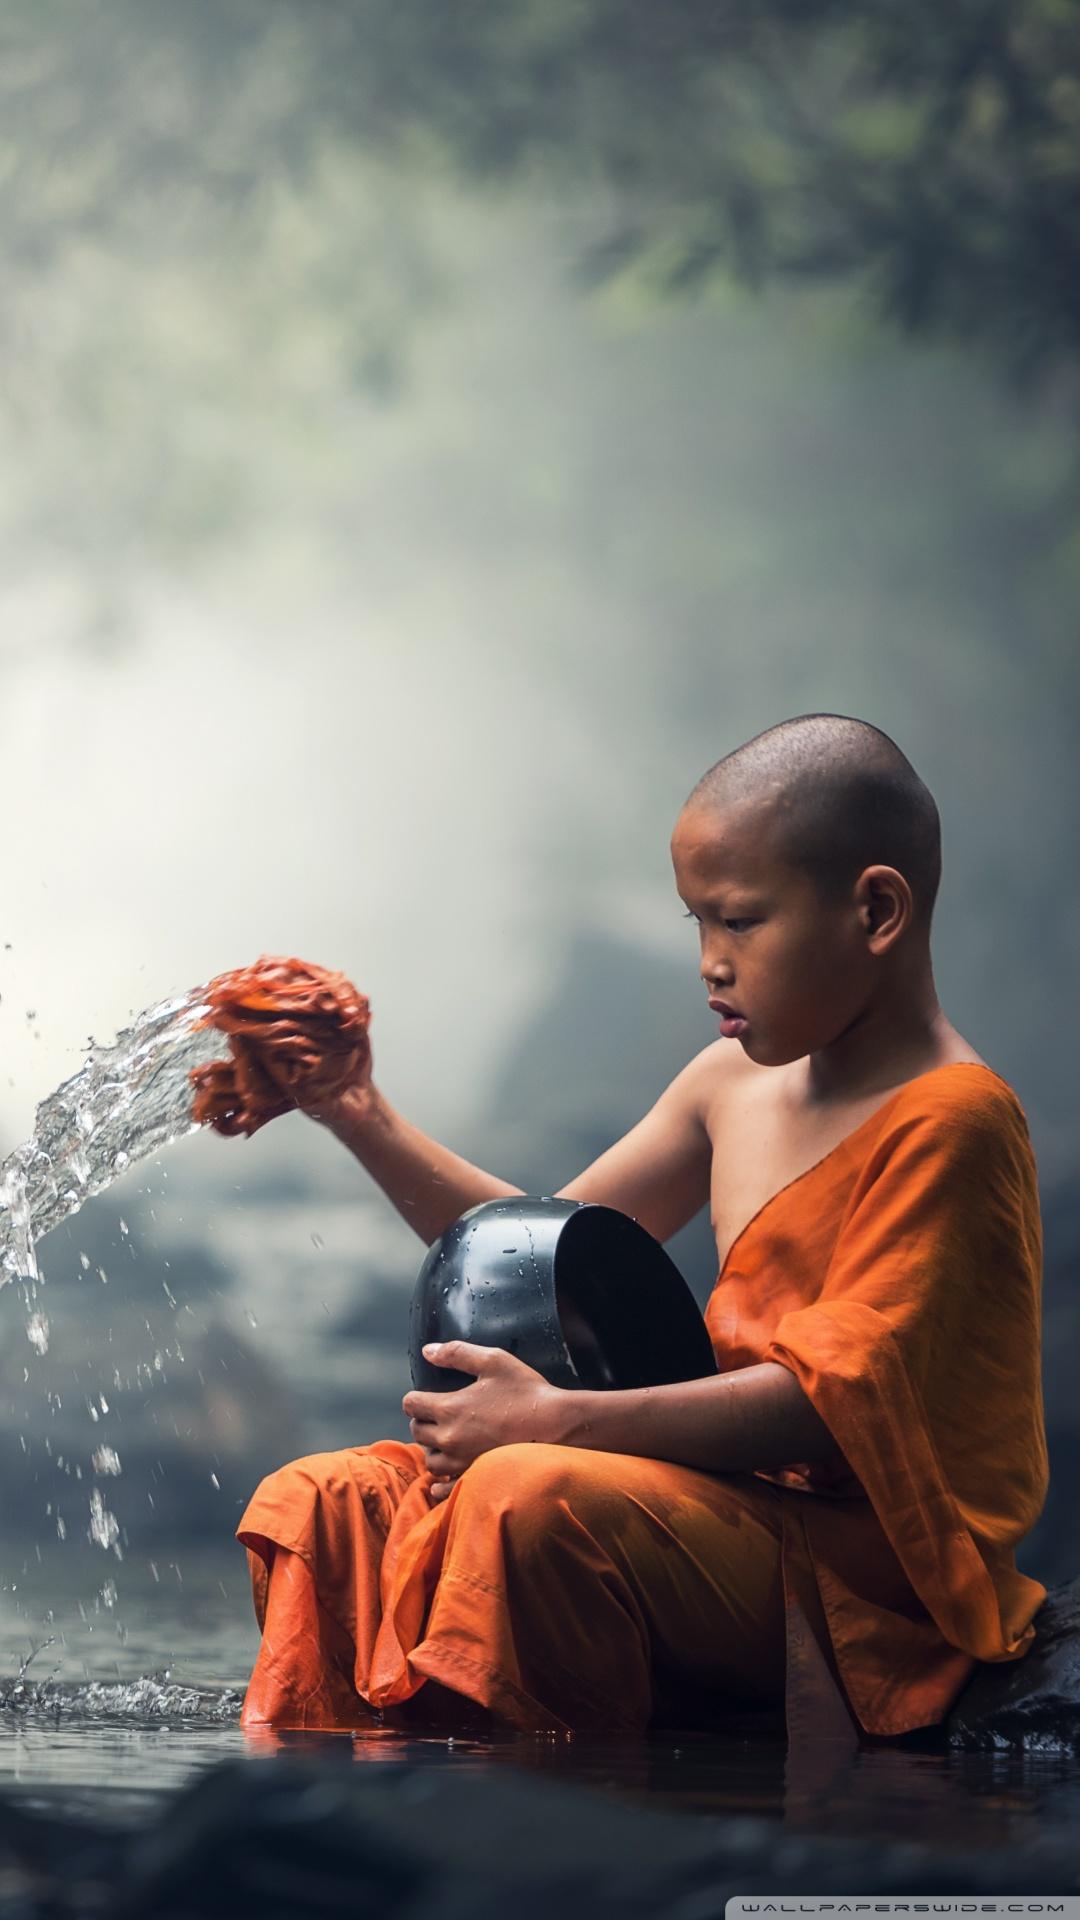 Buddha Wallpaper Hd For Iphone Children Buddhist Monks 4k Hd Desktop Wallpaper For 4k